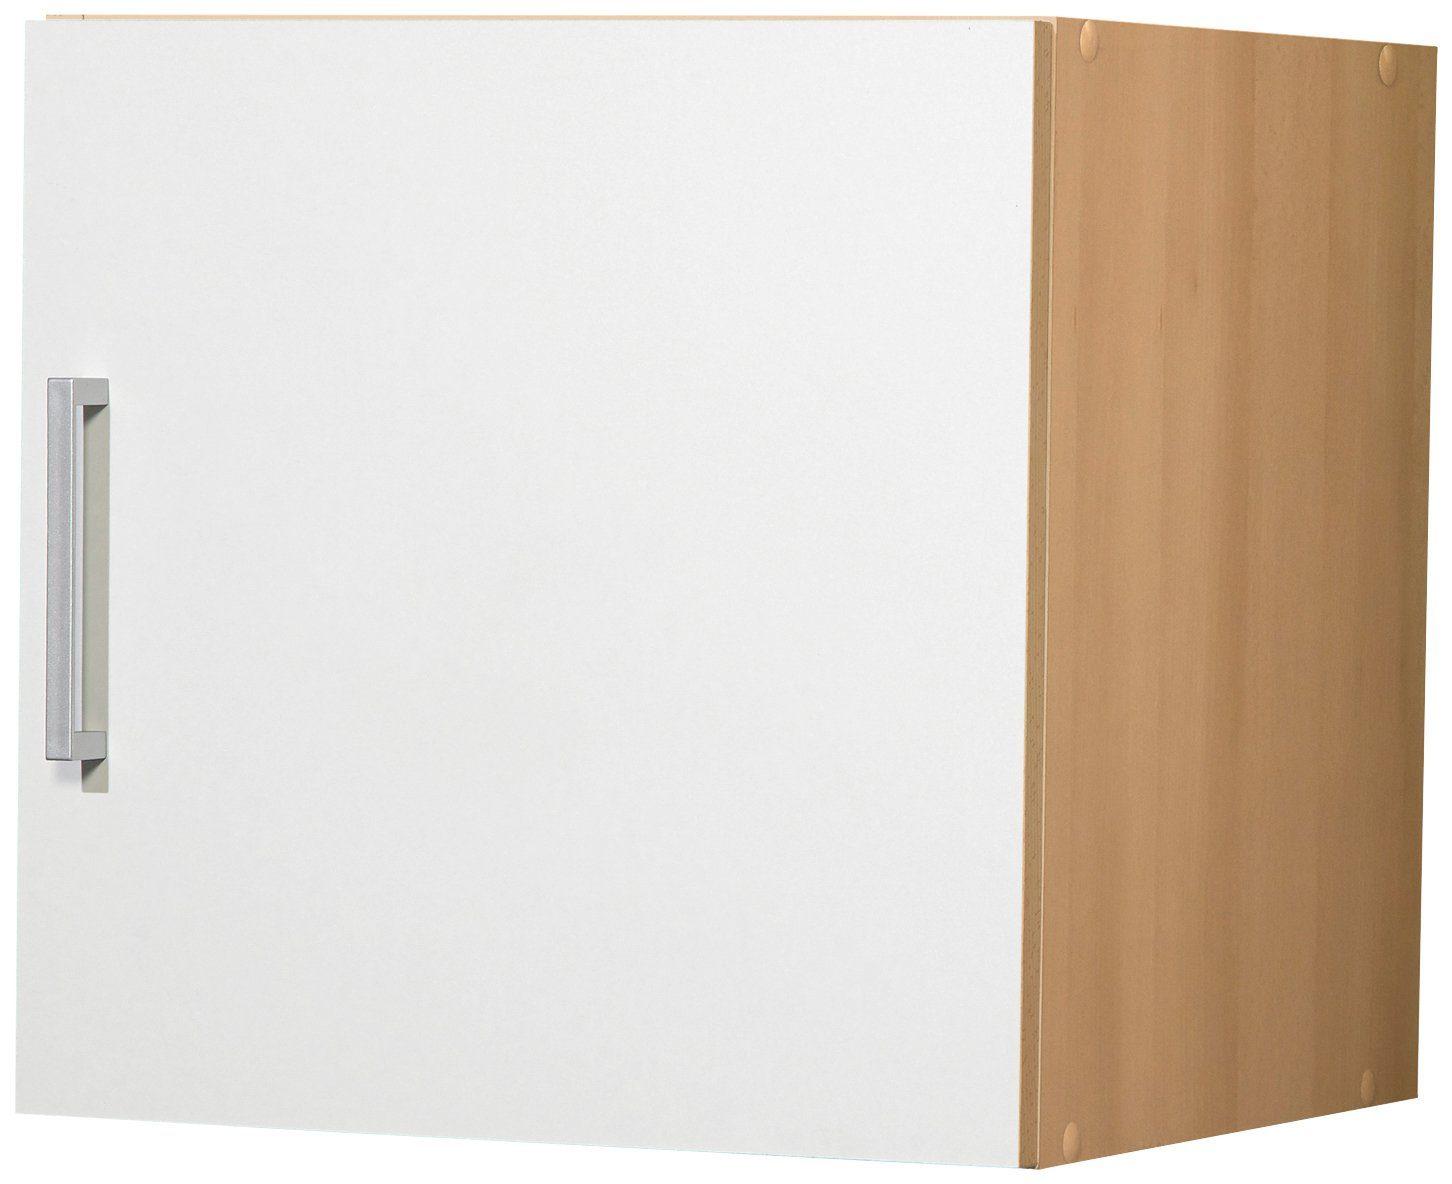 Schrankaufsatz »Ronny«, Maße 40x39x40 cm